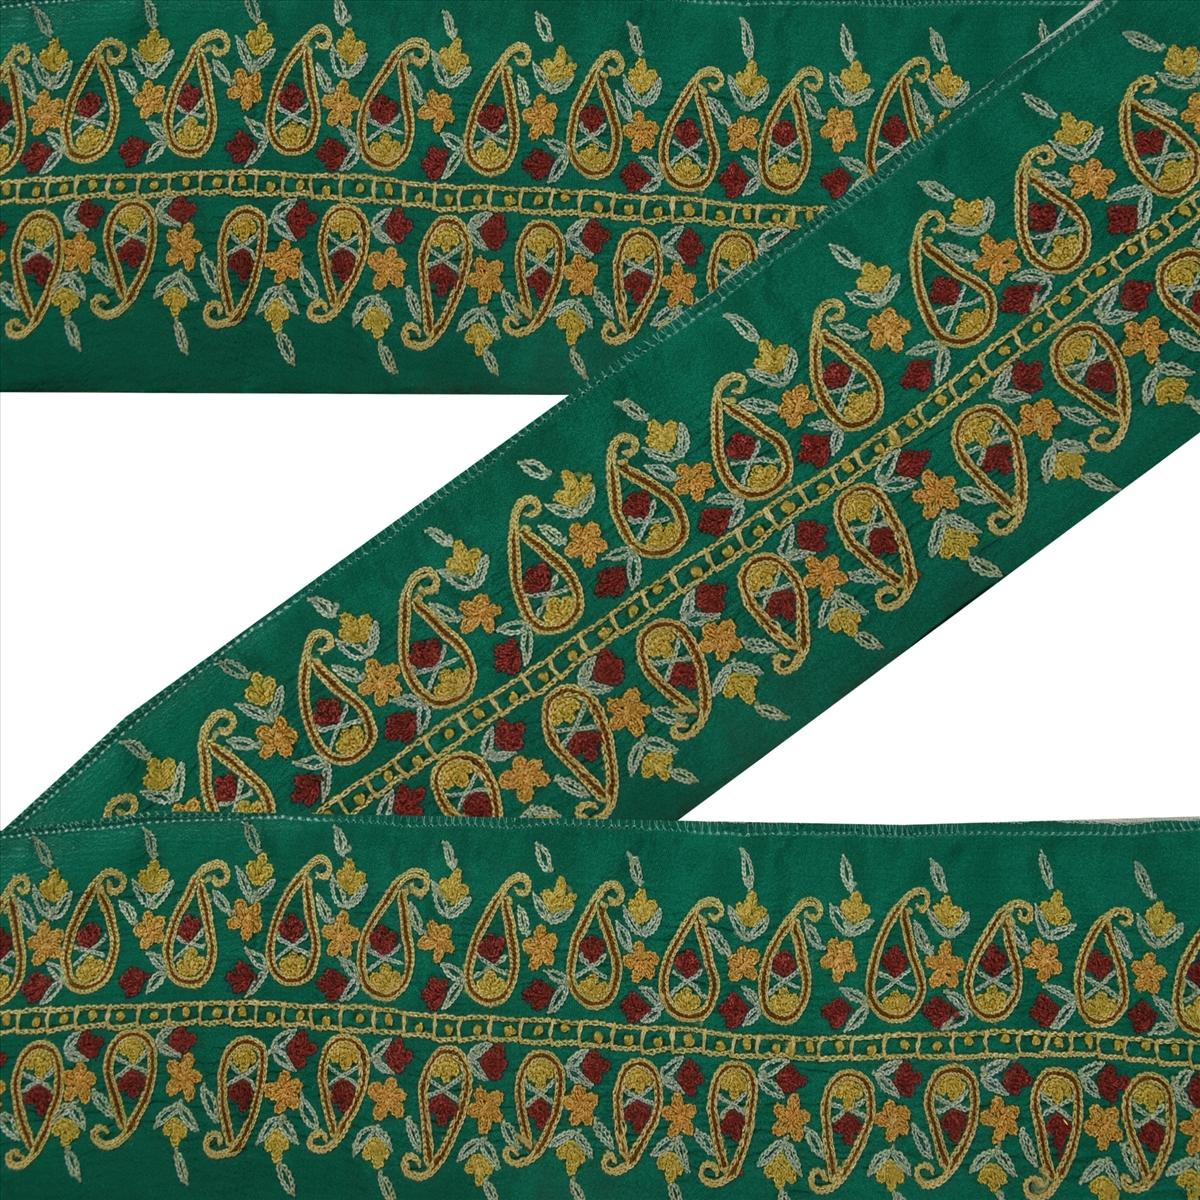 Antique Vintage Saree Border Hand Embroidered Craft Trims 1 Yard